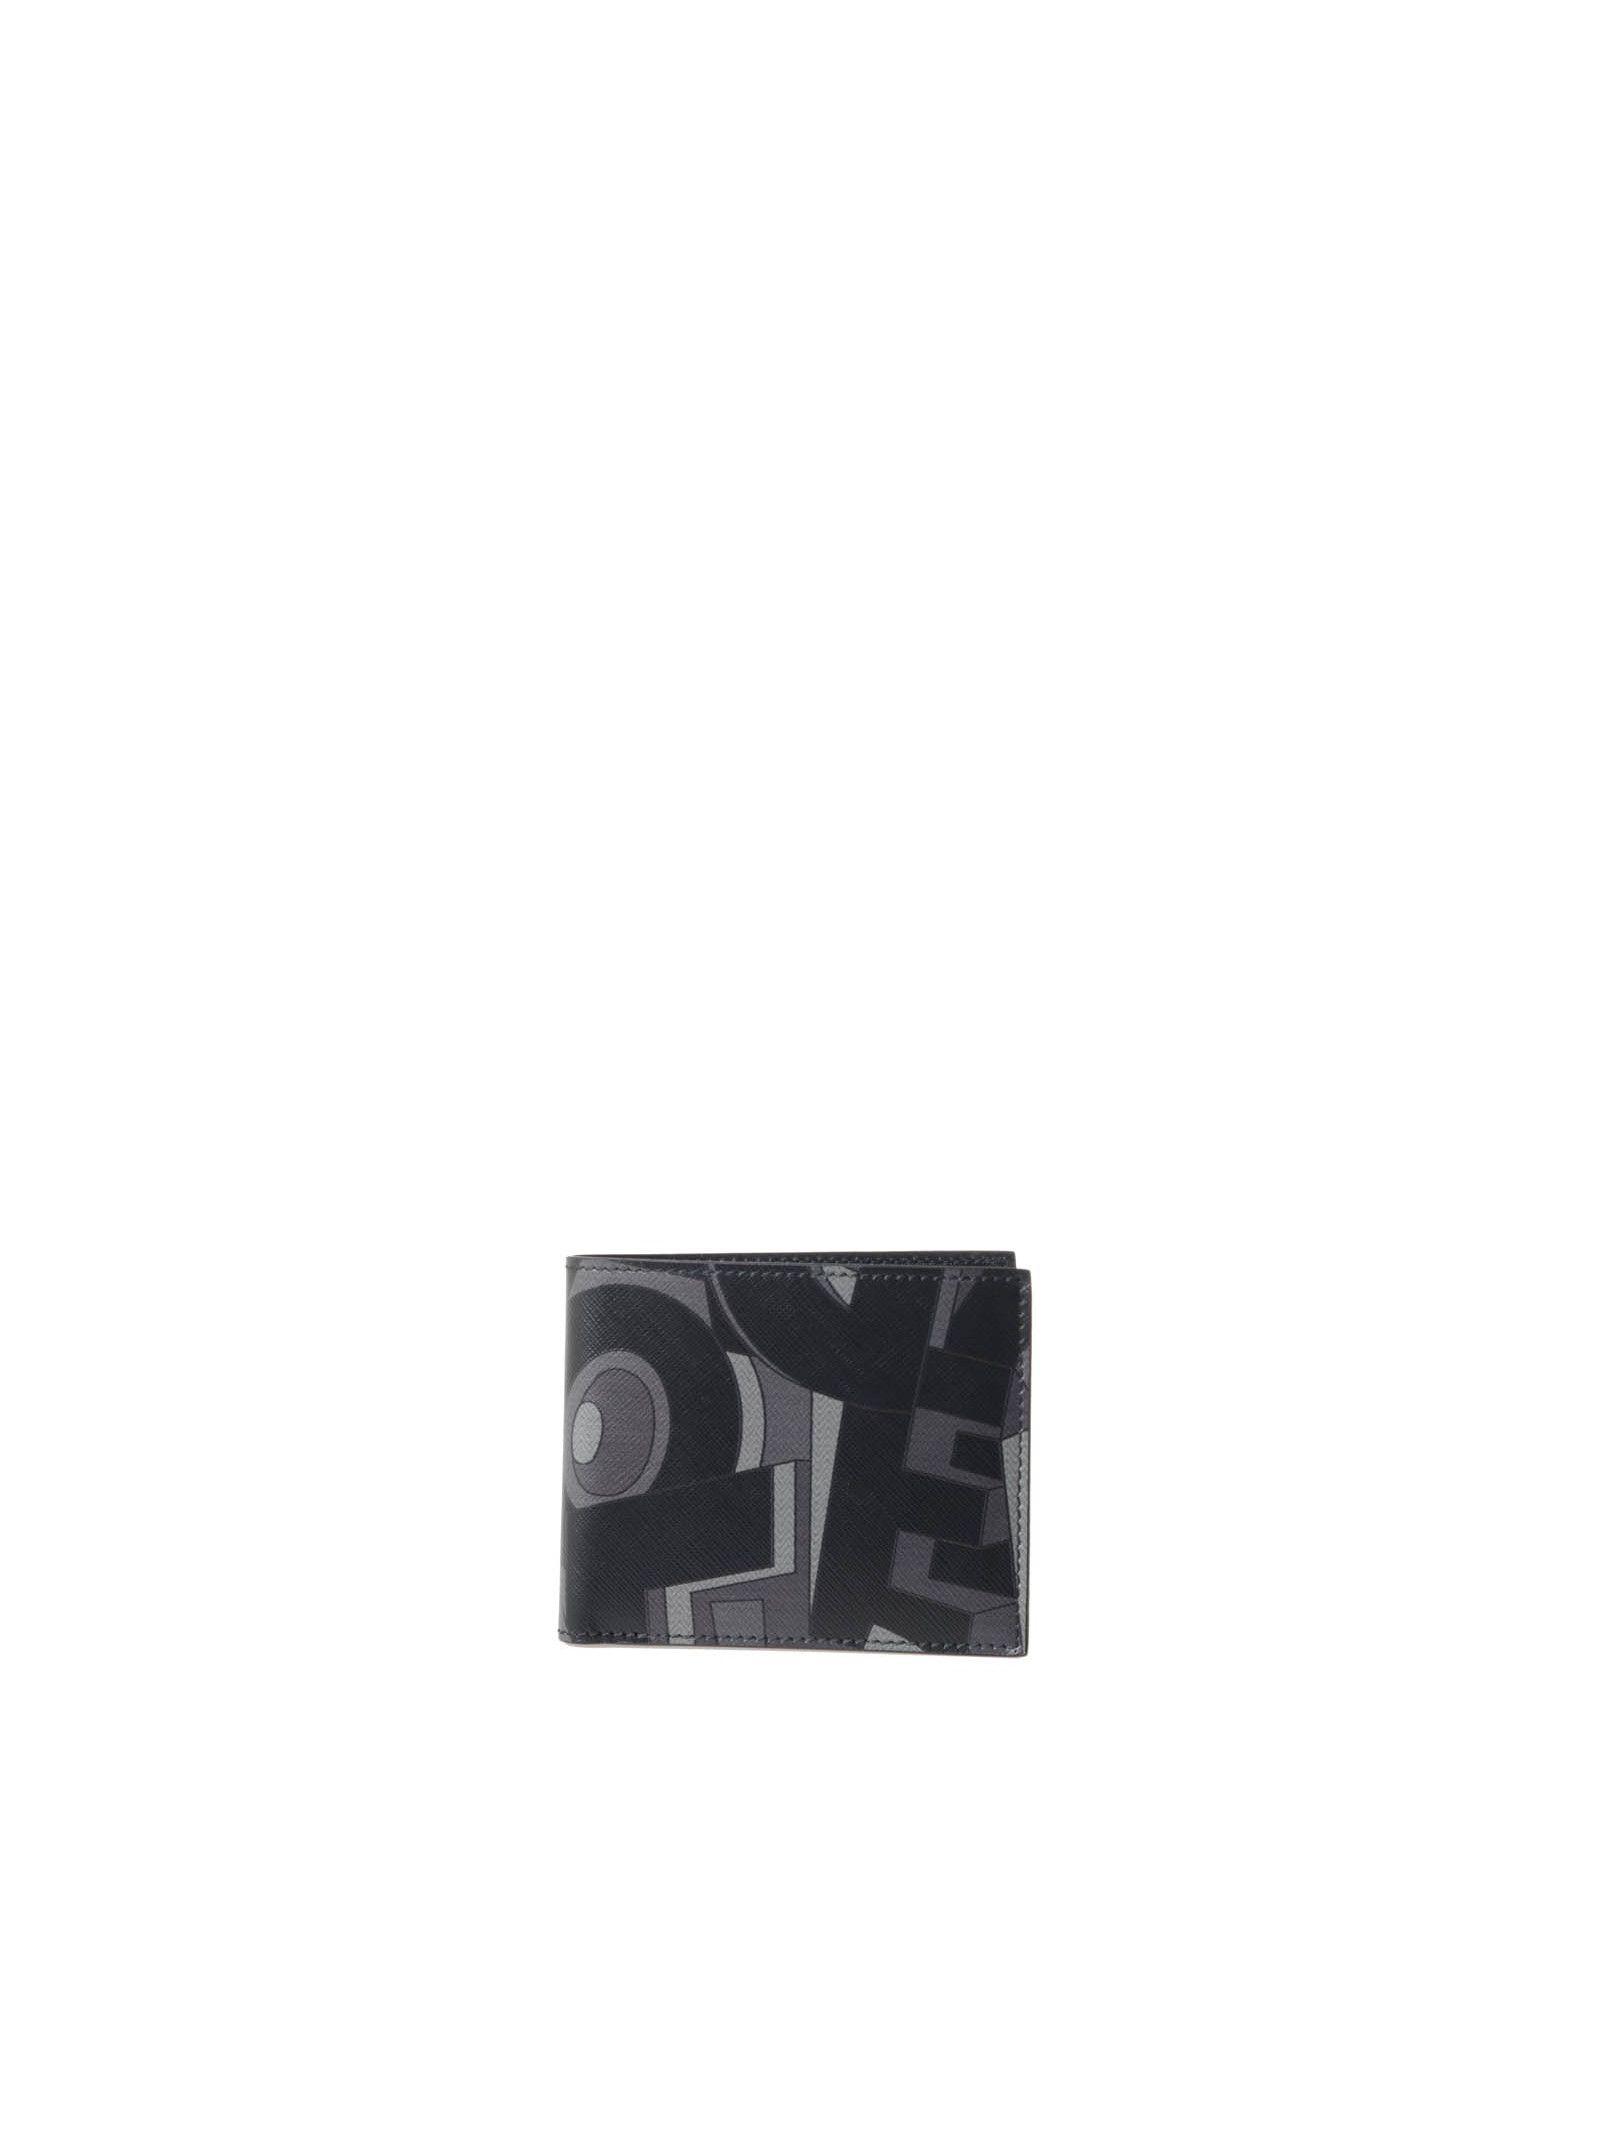 Salvatore Ferragamo Printed Leather Wallet